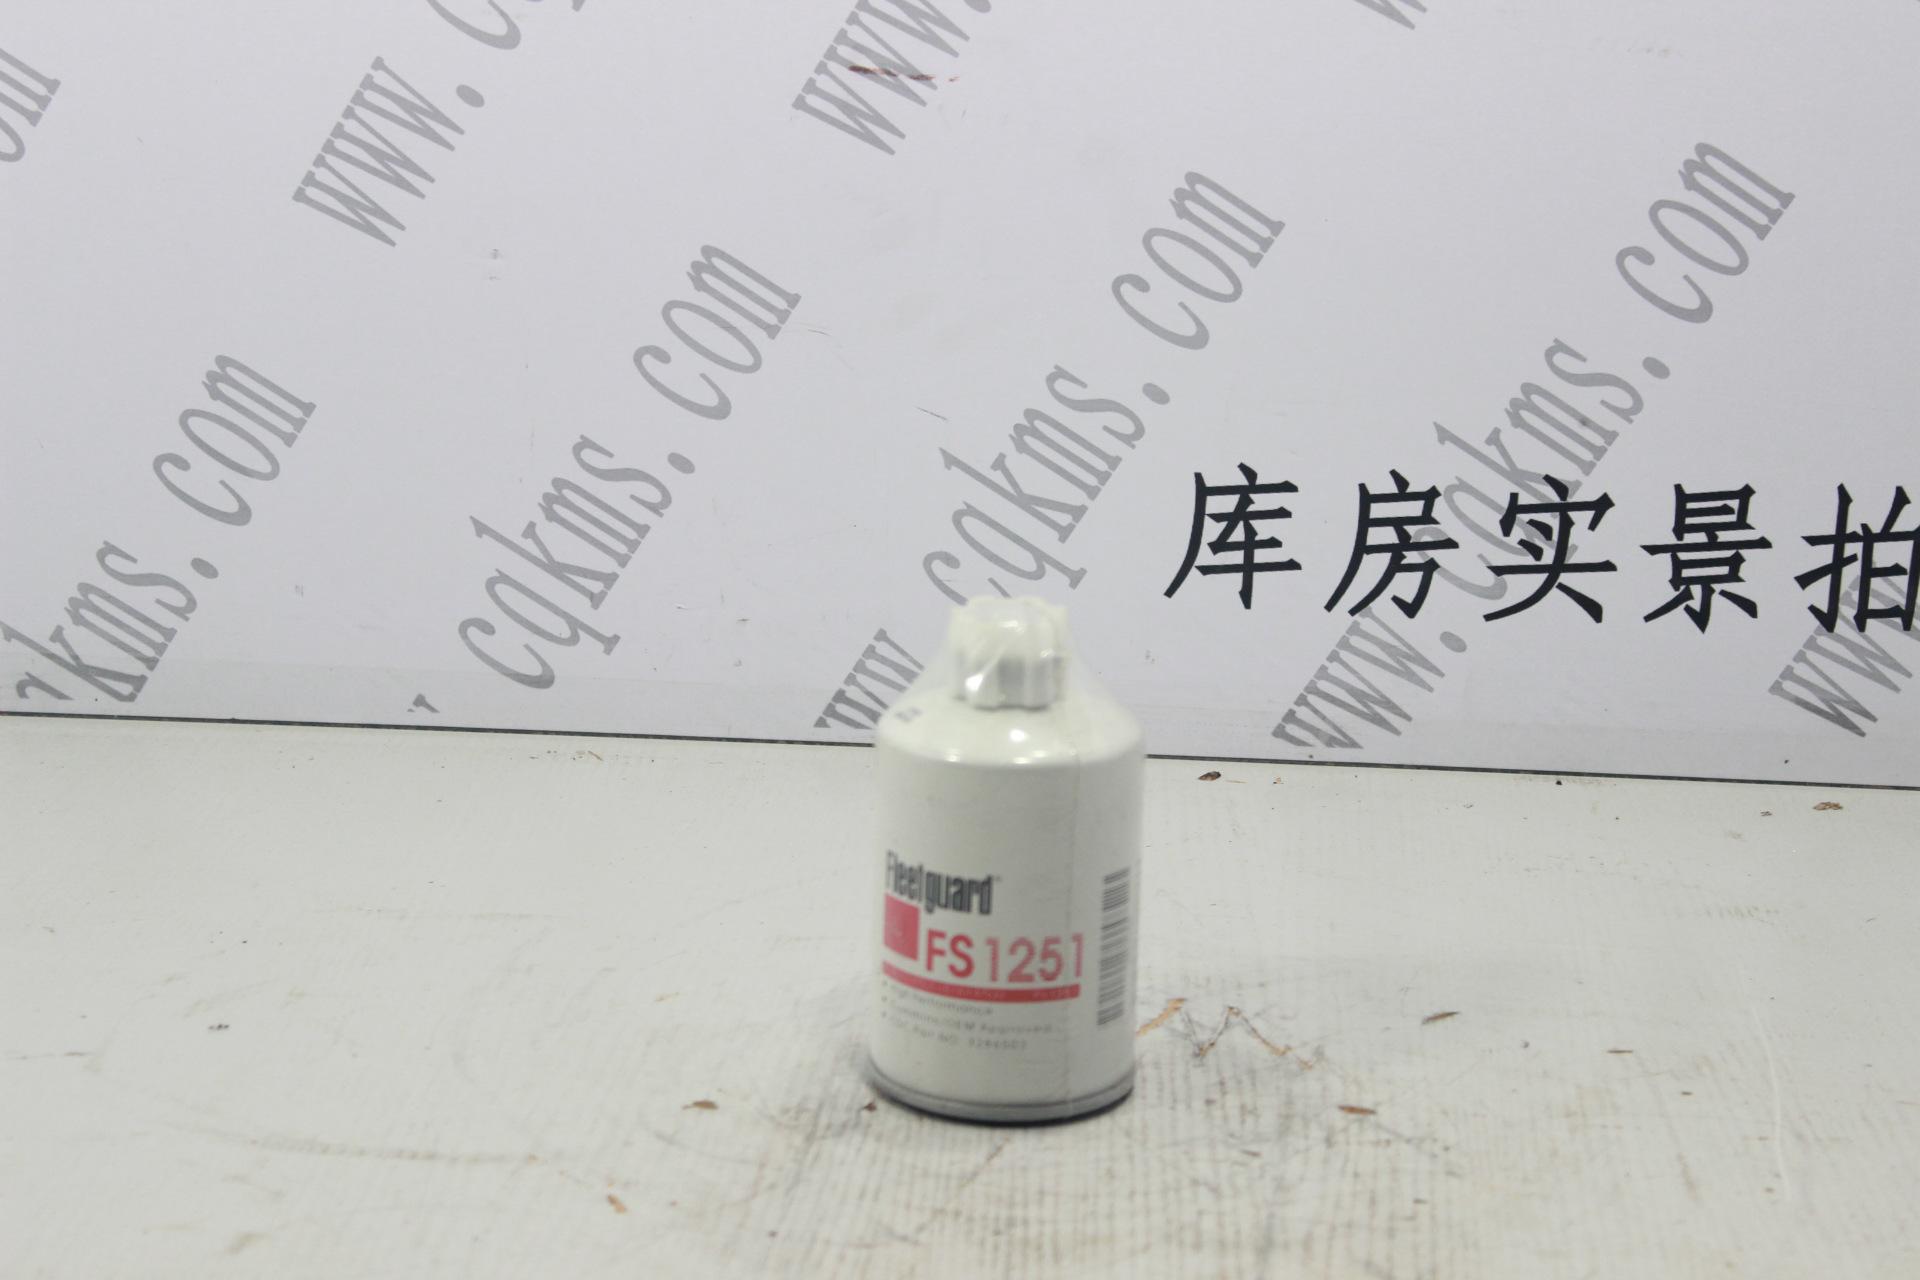 kms01682-FS1251-燃油滤清器----参考重量450-450图片4